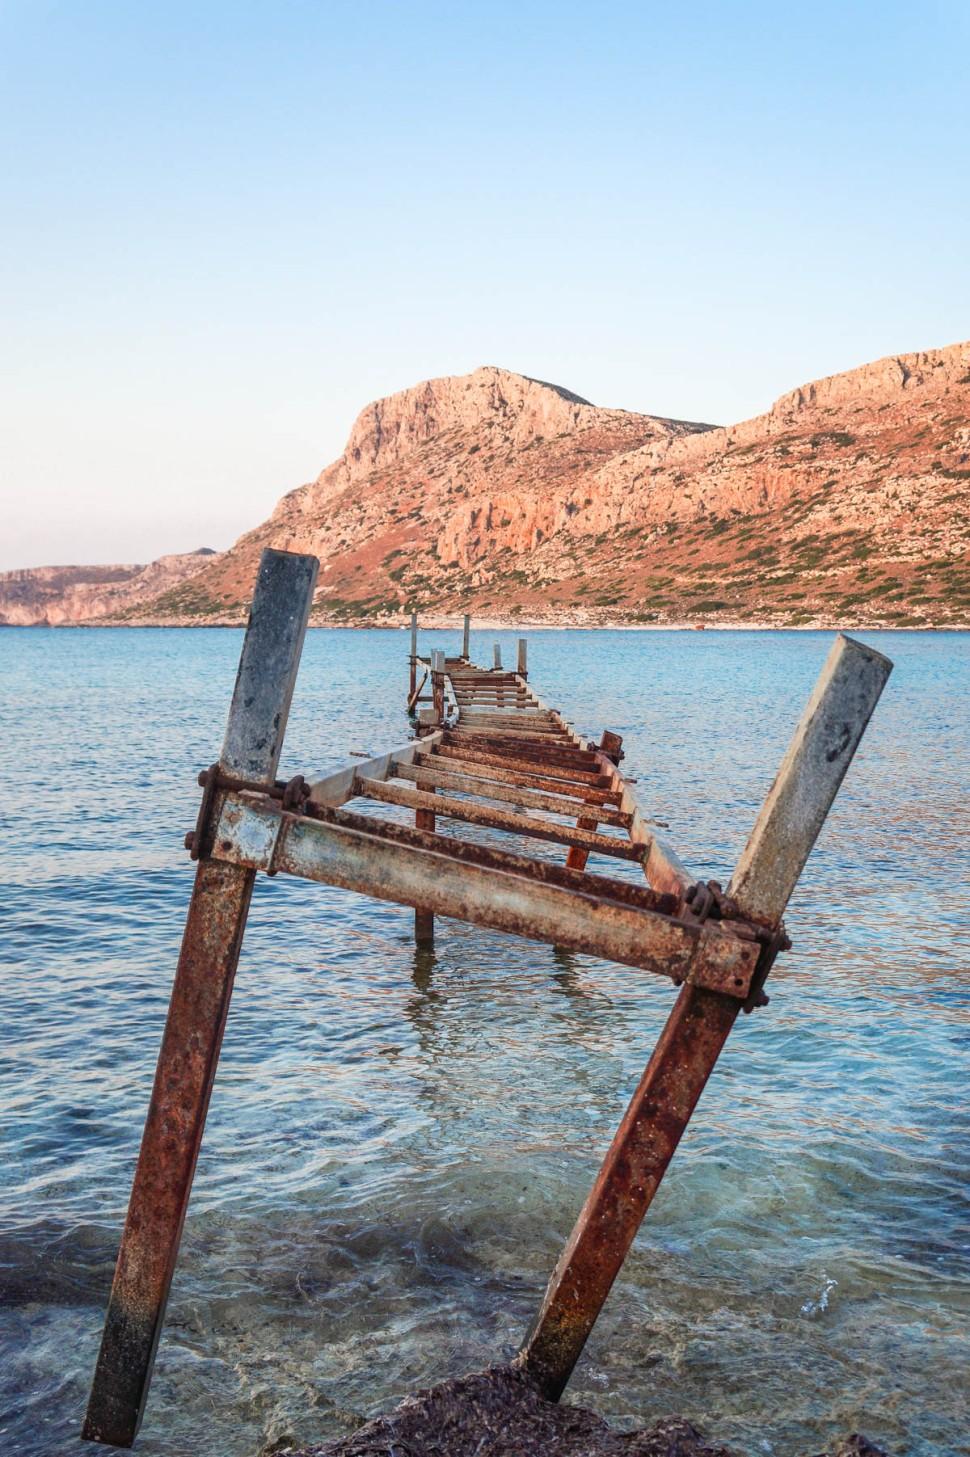 mpalos-beach-crete-greece-la-vie-en-blog-all-rights-reserved-25